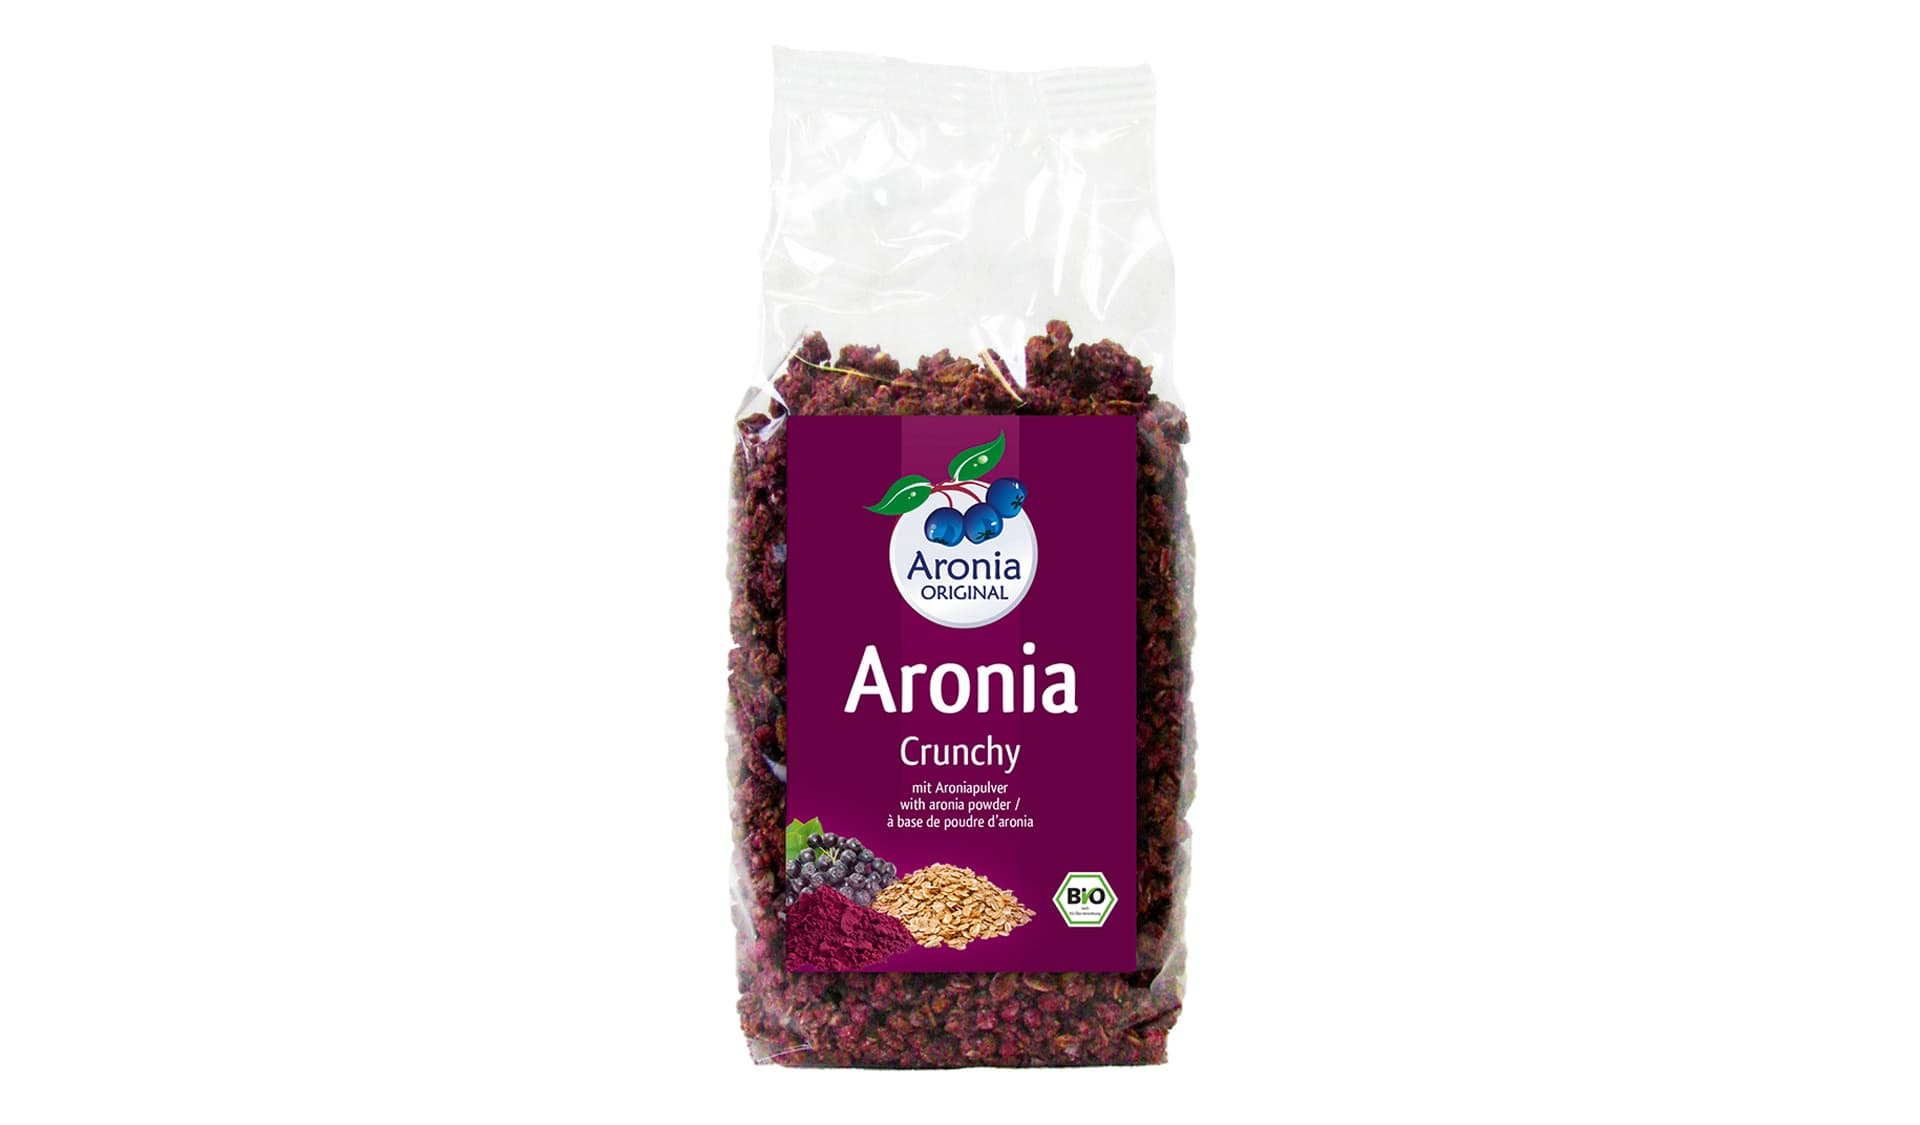 Aronia Original (www.aronia-original.de) Aronia Crunchy